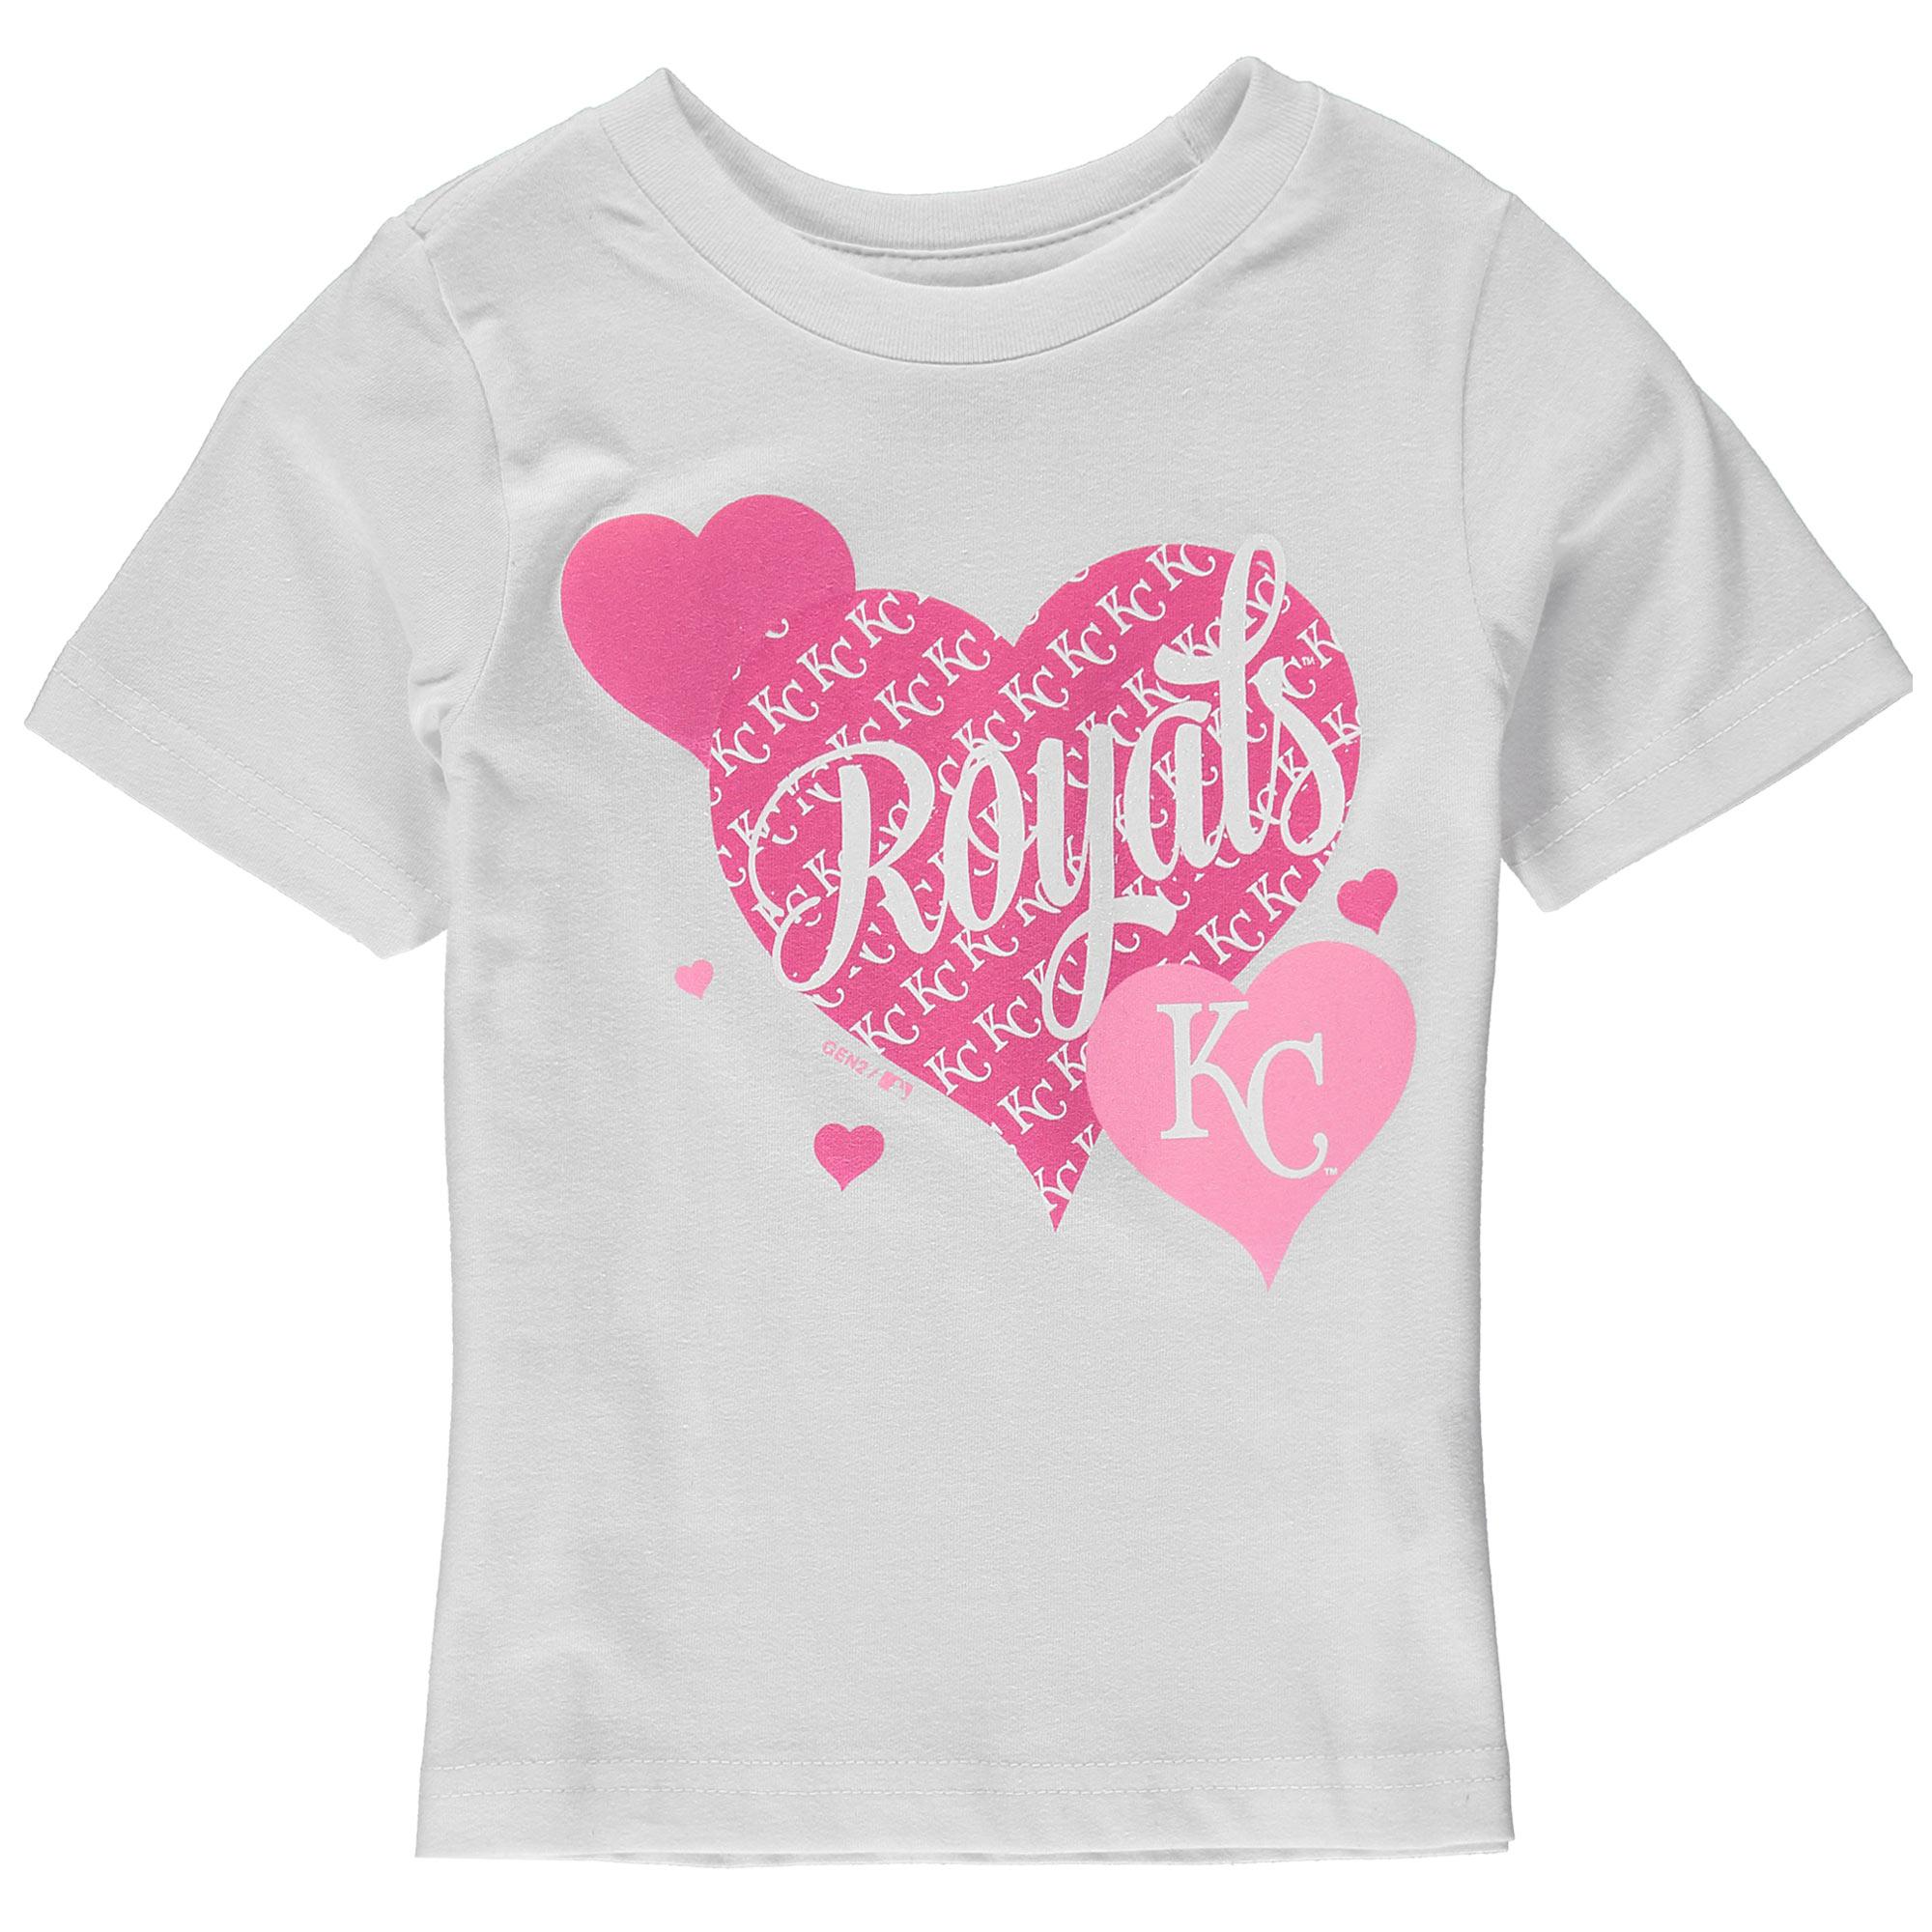 Kansas City Royals Girls Toddler Bubbly Luv T-Shirt - White